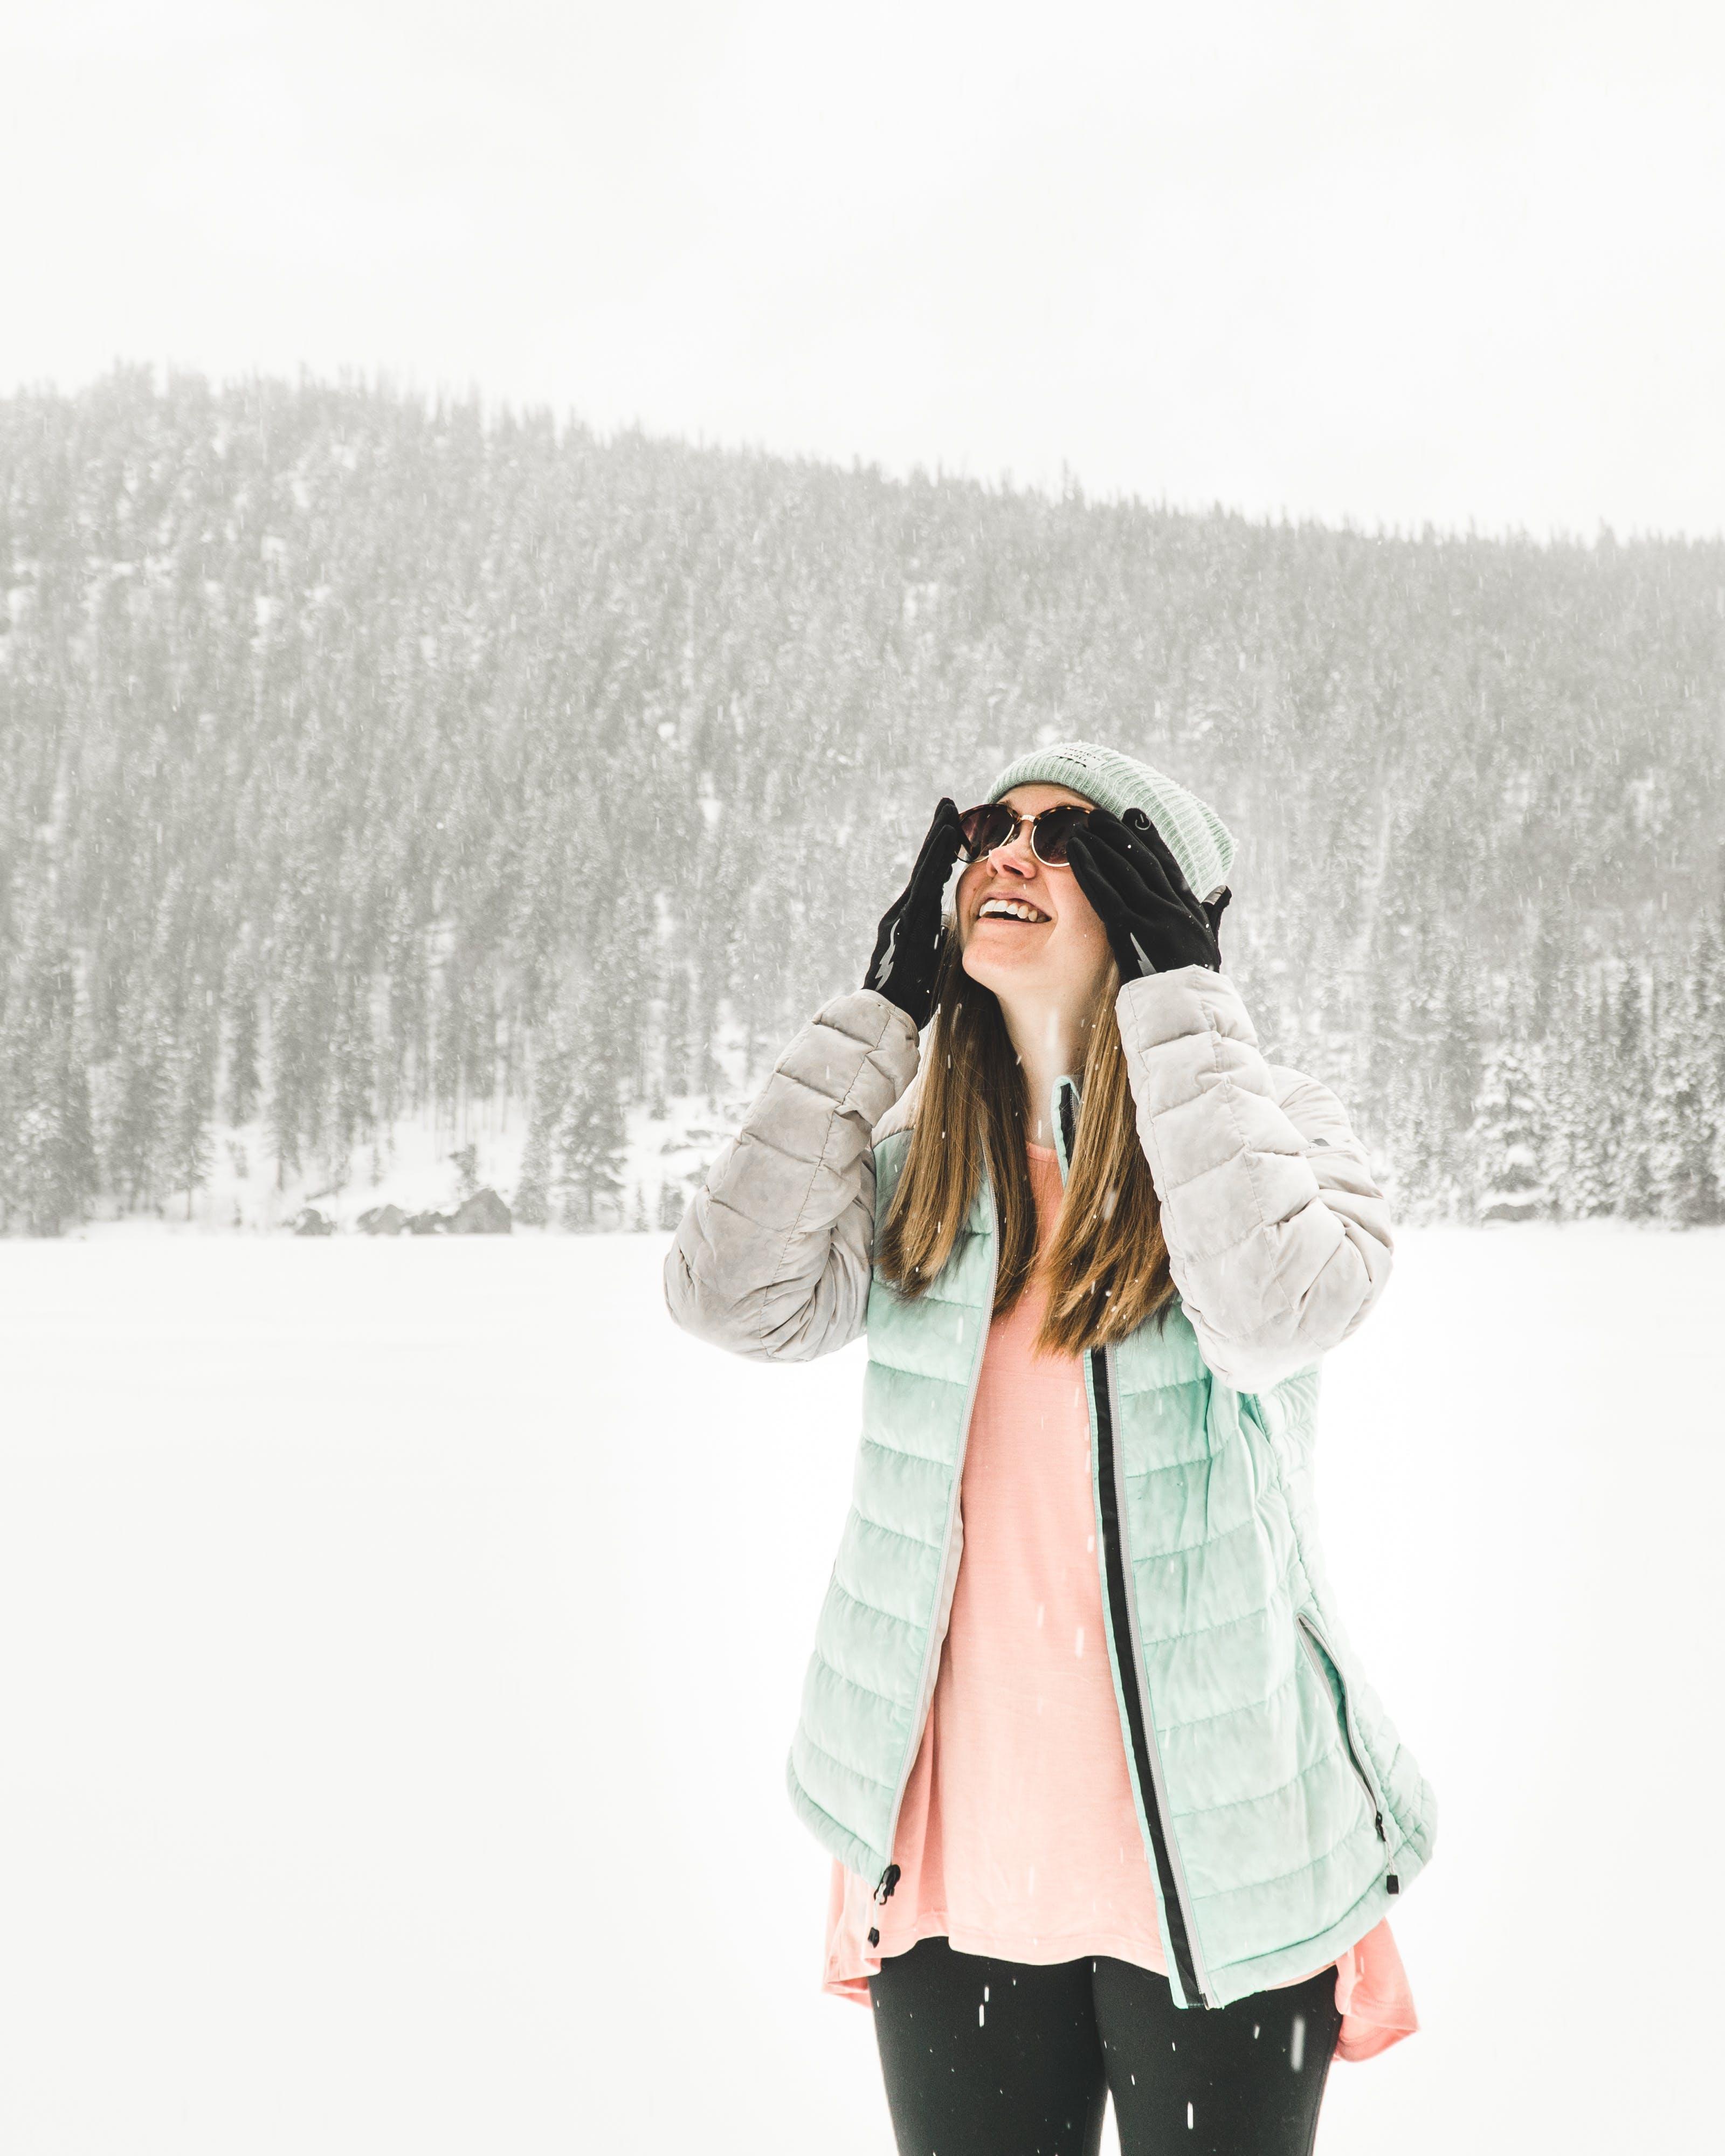 Kostenloses Stock Foto zu colorado, fashion, frau, freude